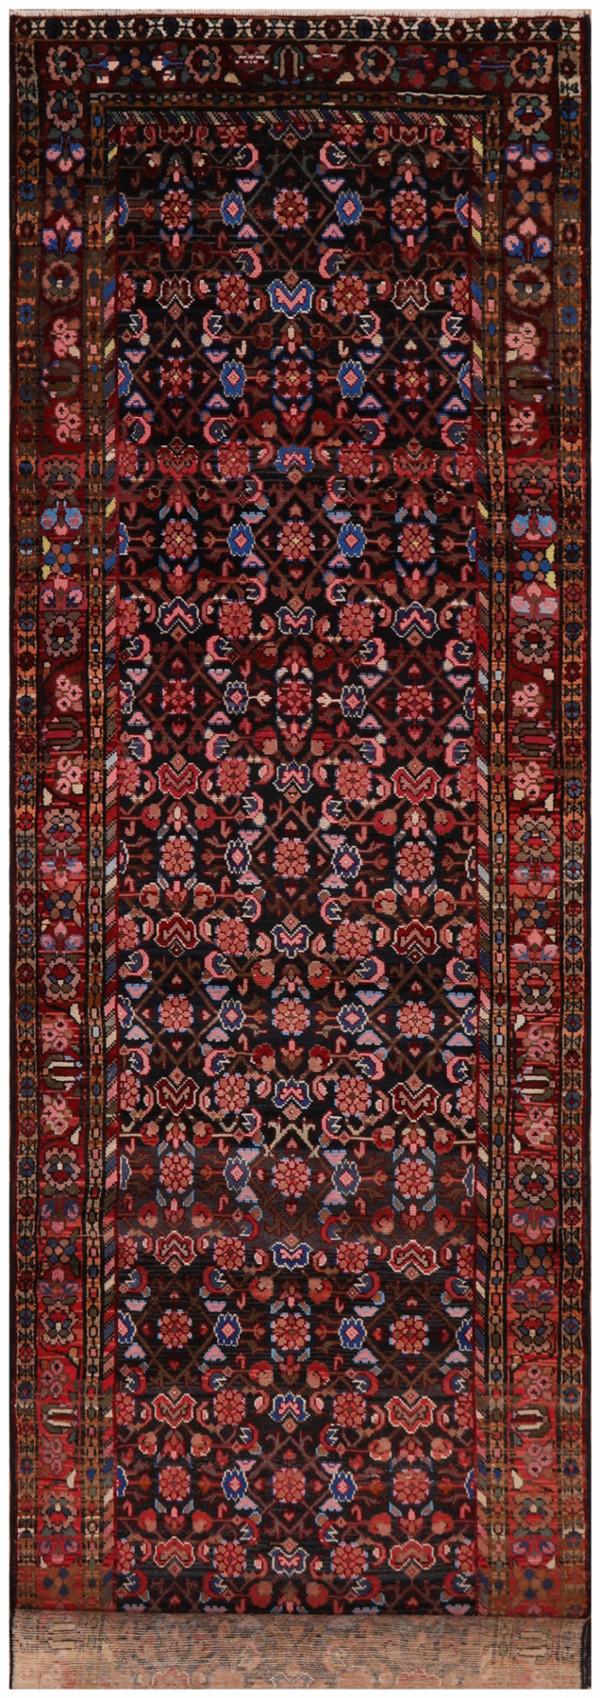 #52049 Cotton Persian Rug